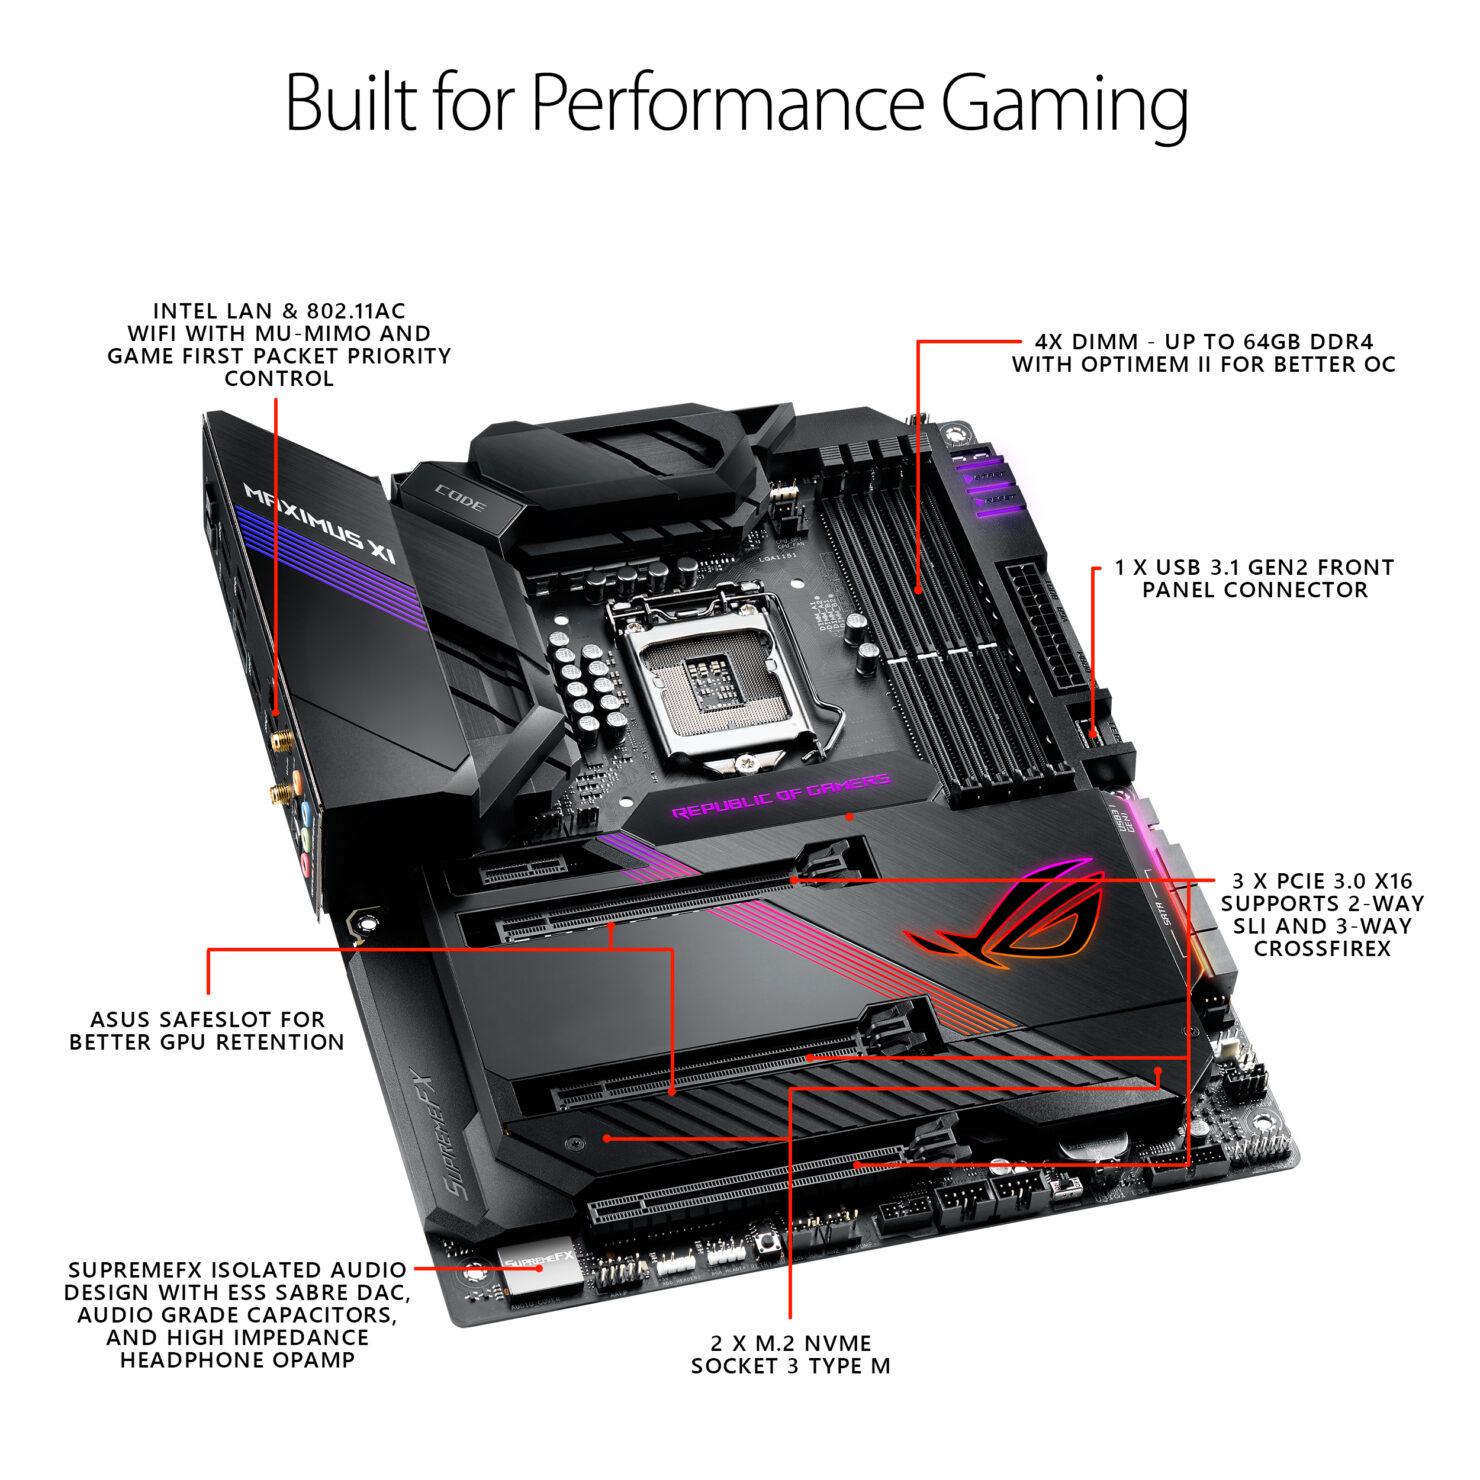 4-rog-maximus-xi-code-built-for-performance-gaming